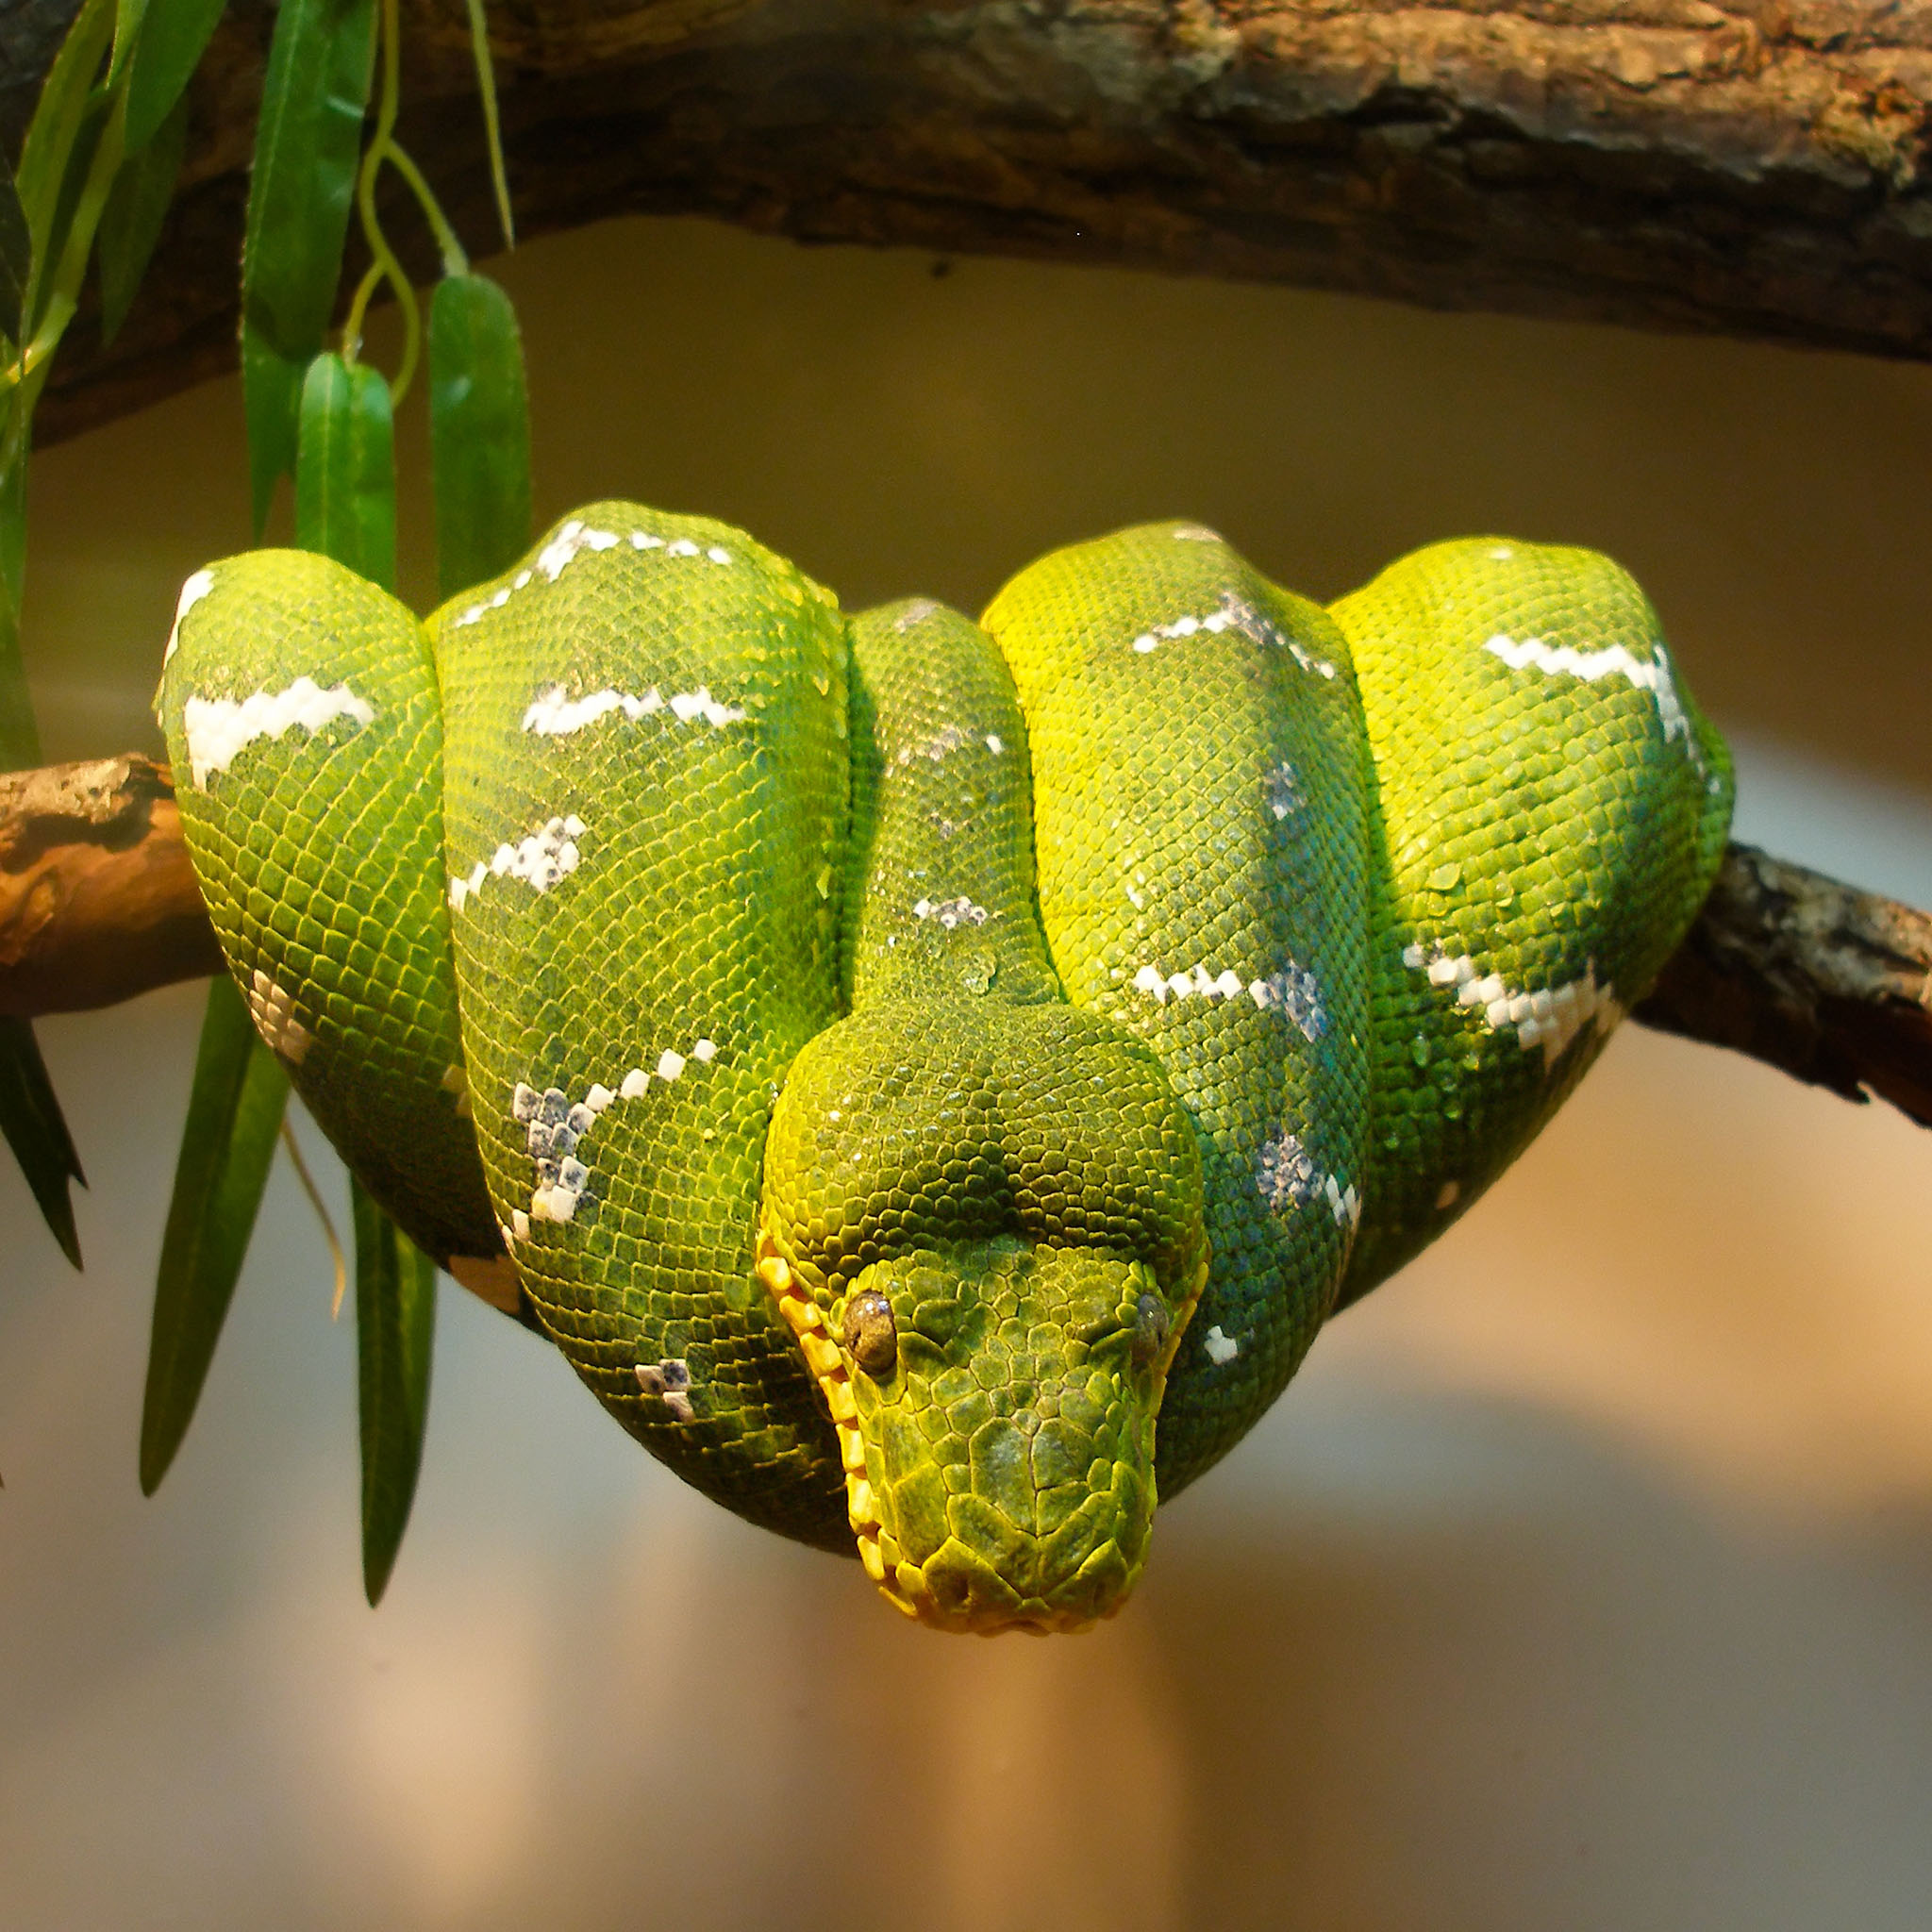 http://www.uplooder.net/img/image/87/ab63b3affb6f2c0656c2b0819712cb5d/green-tree-python-2048-ipod-backgrounds.jpg